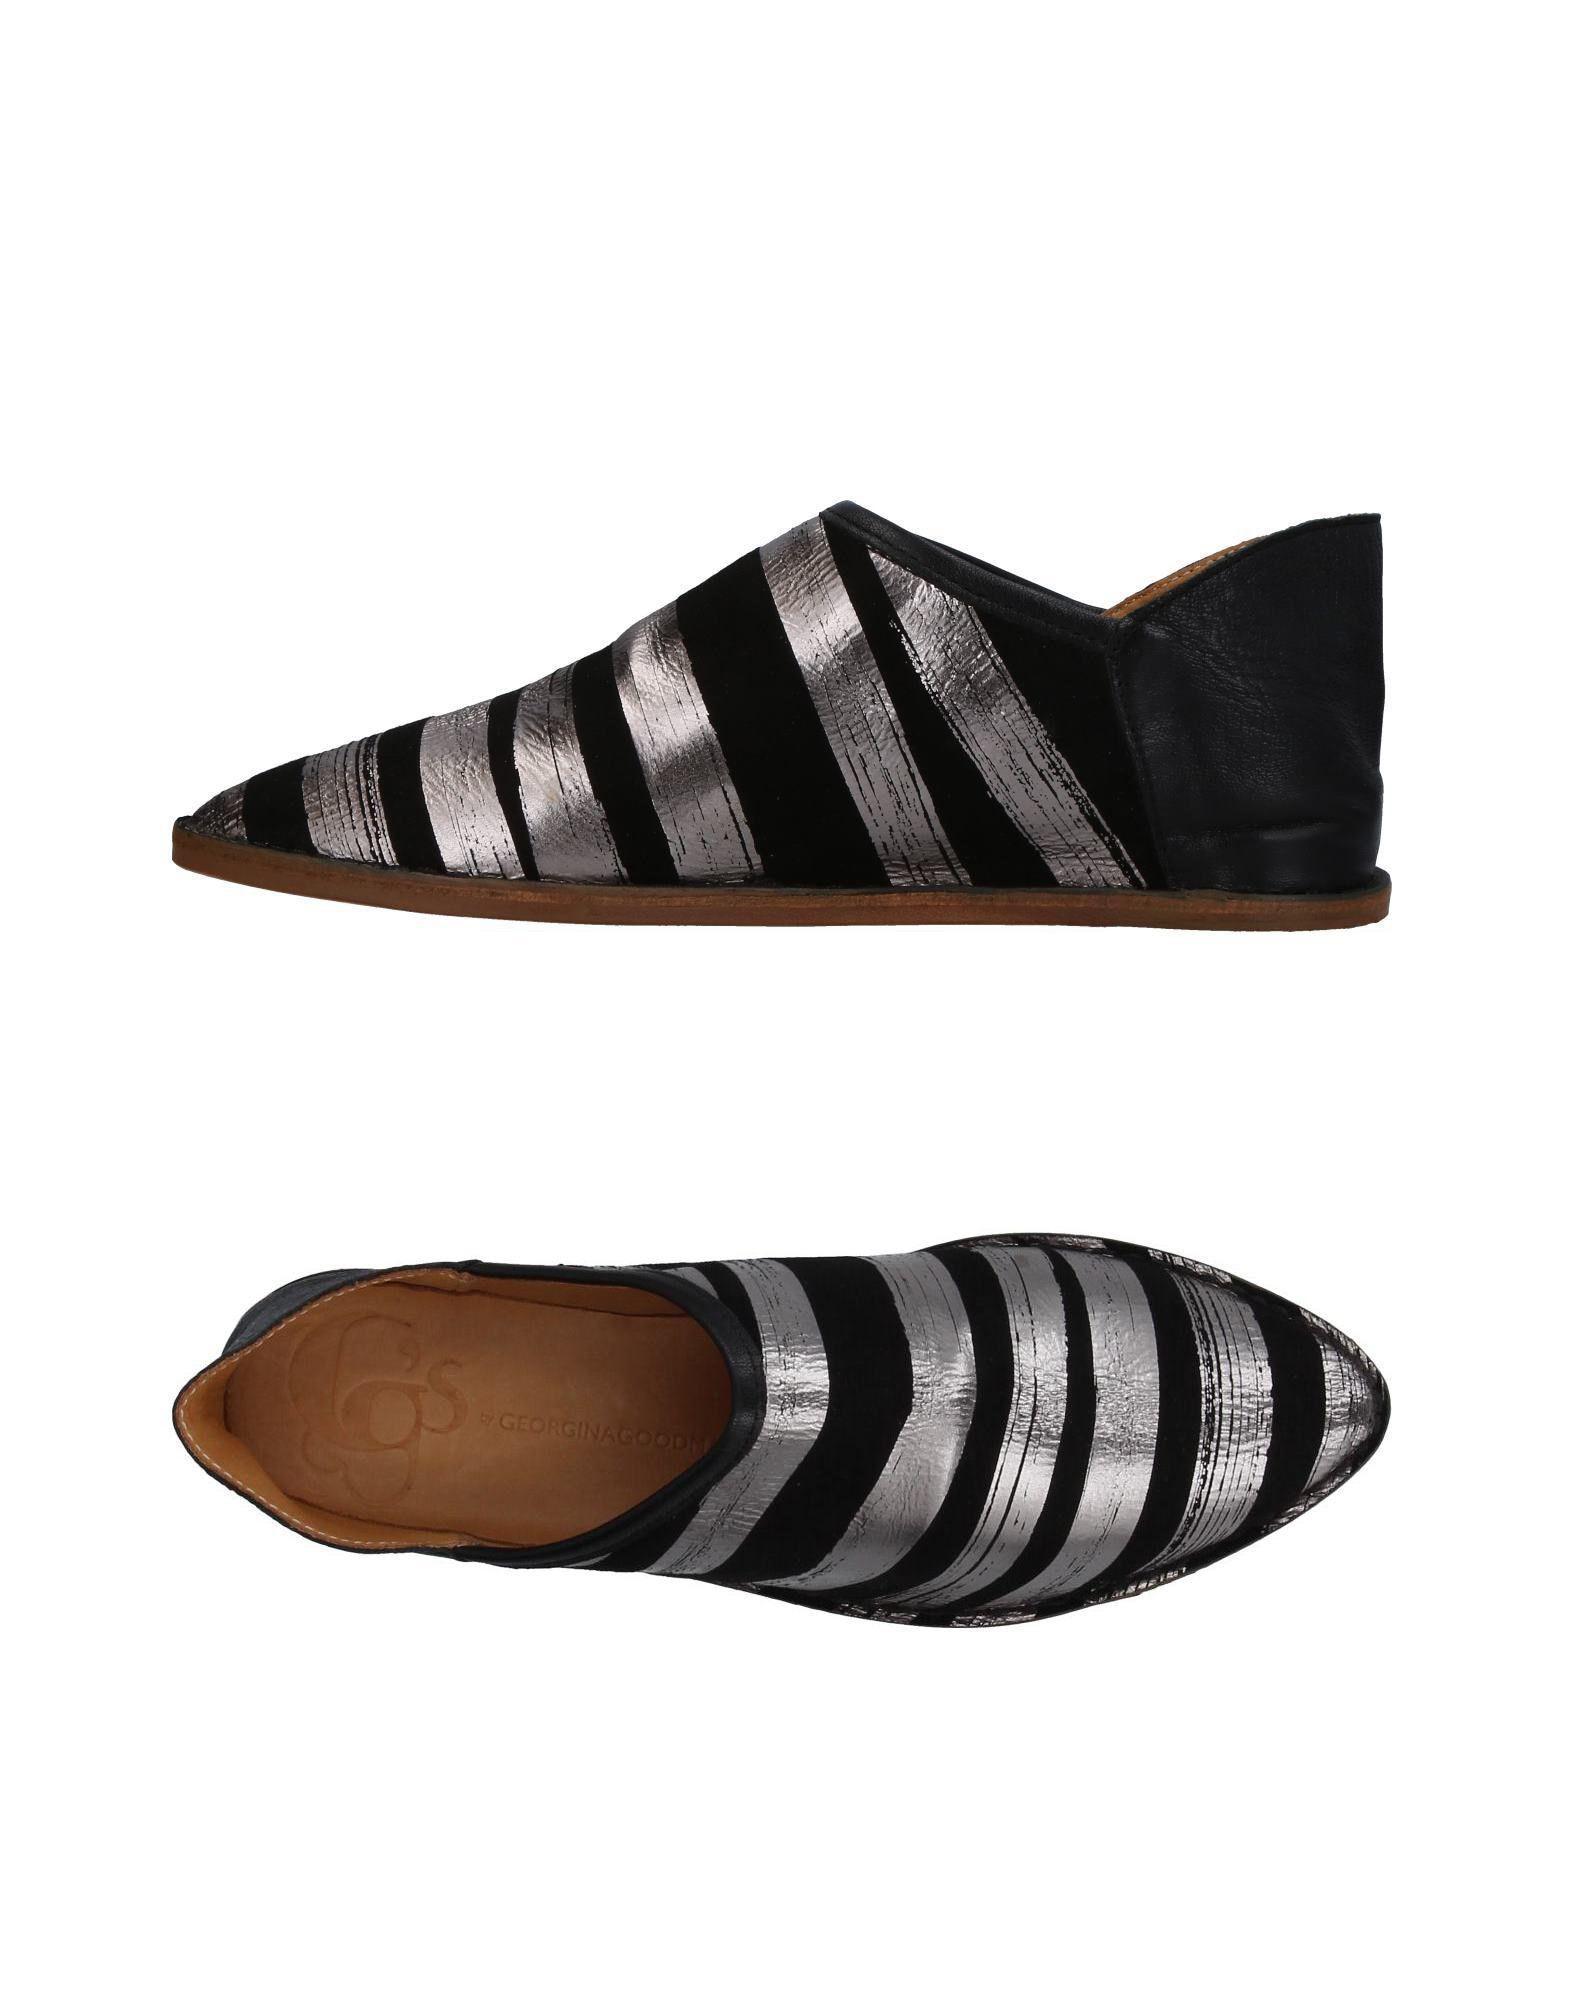 FOOTWEAR - Loafers Georgina Goodman Cheap Sale Discounts xqx8T1Reb